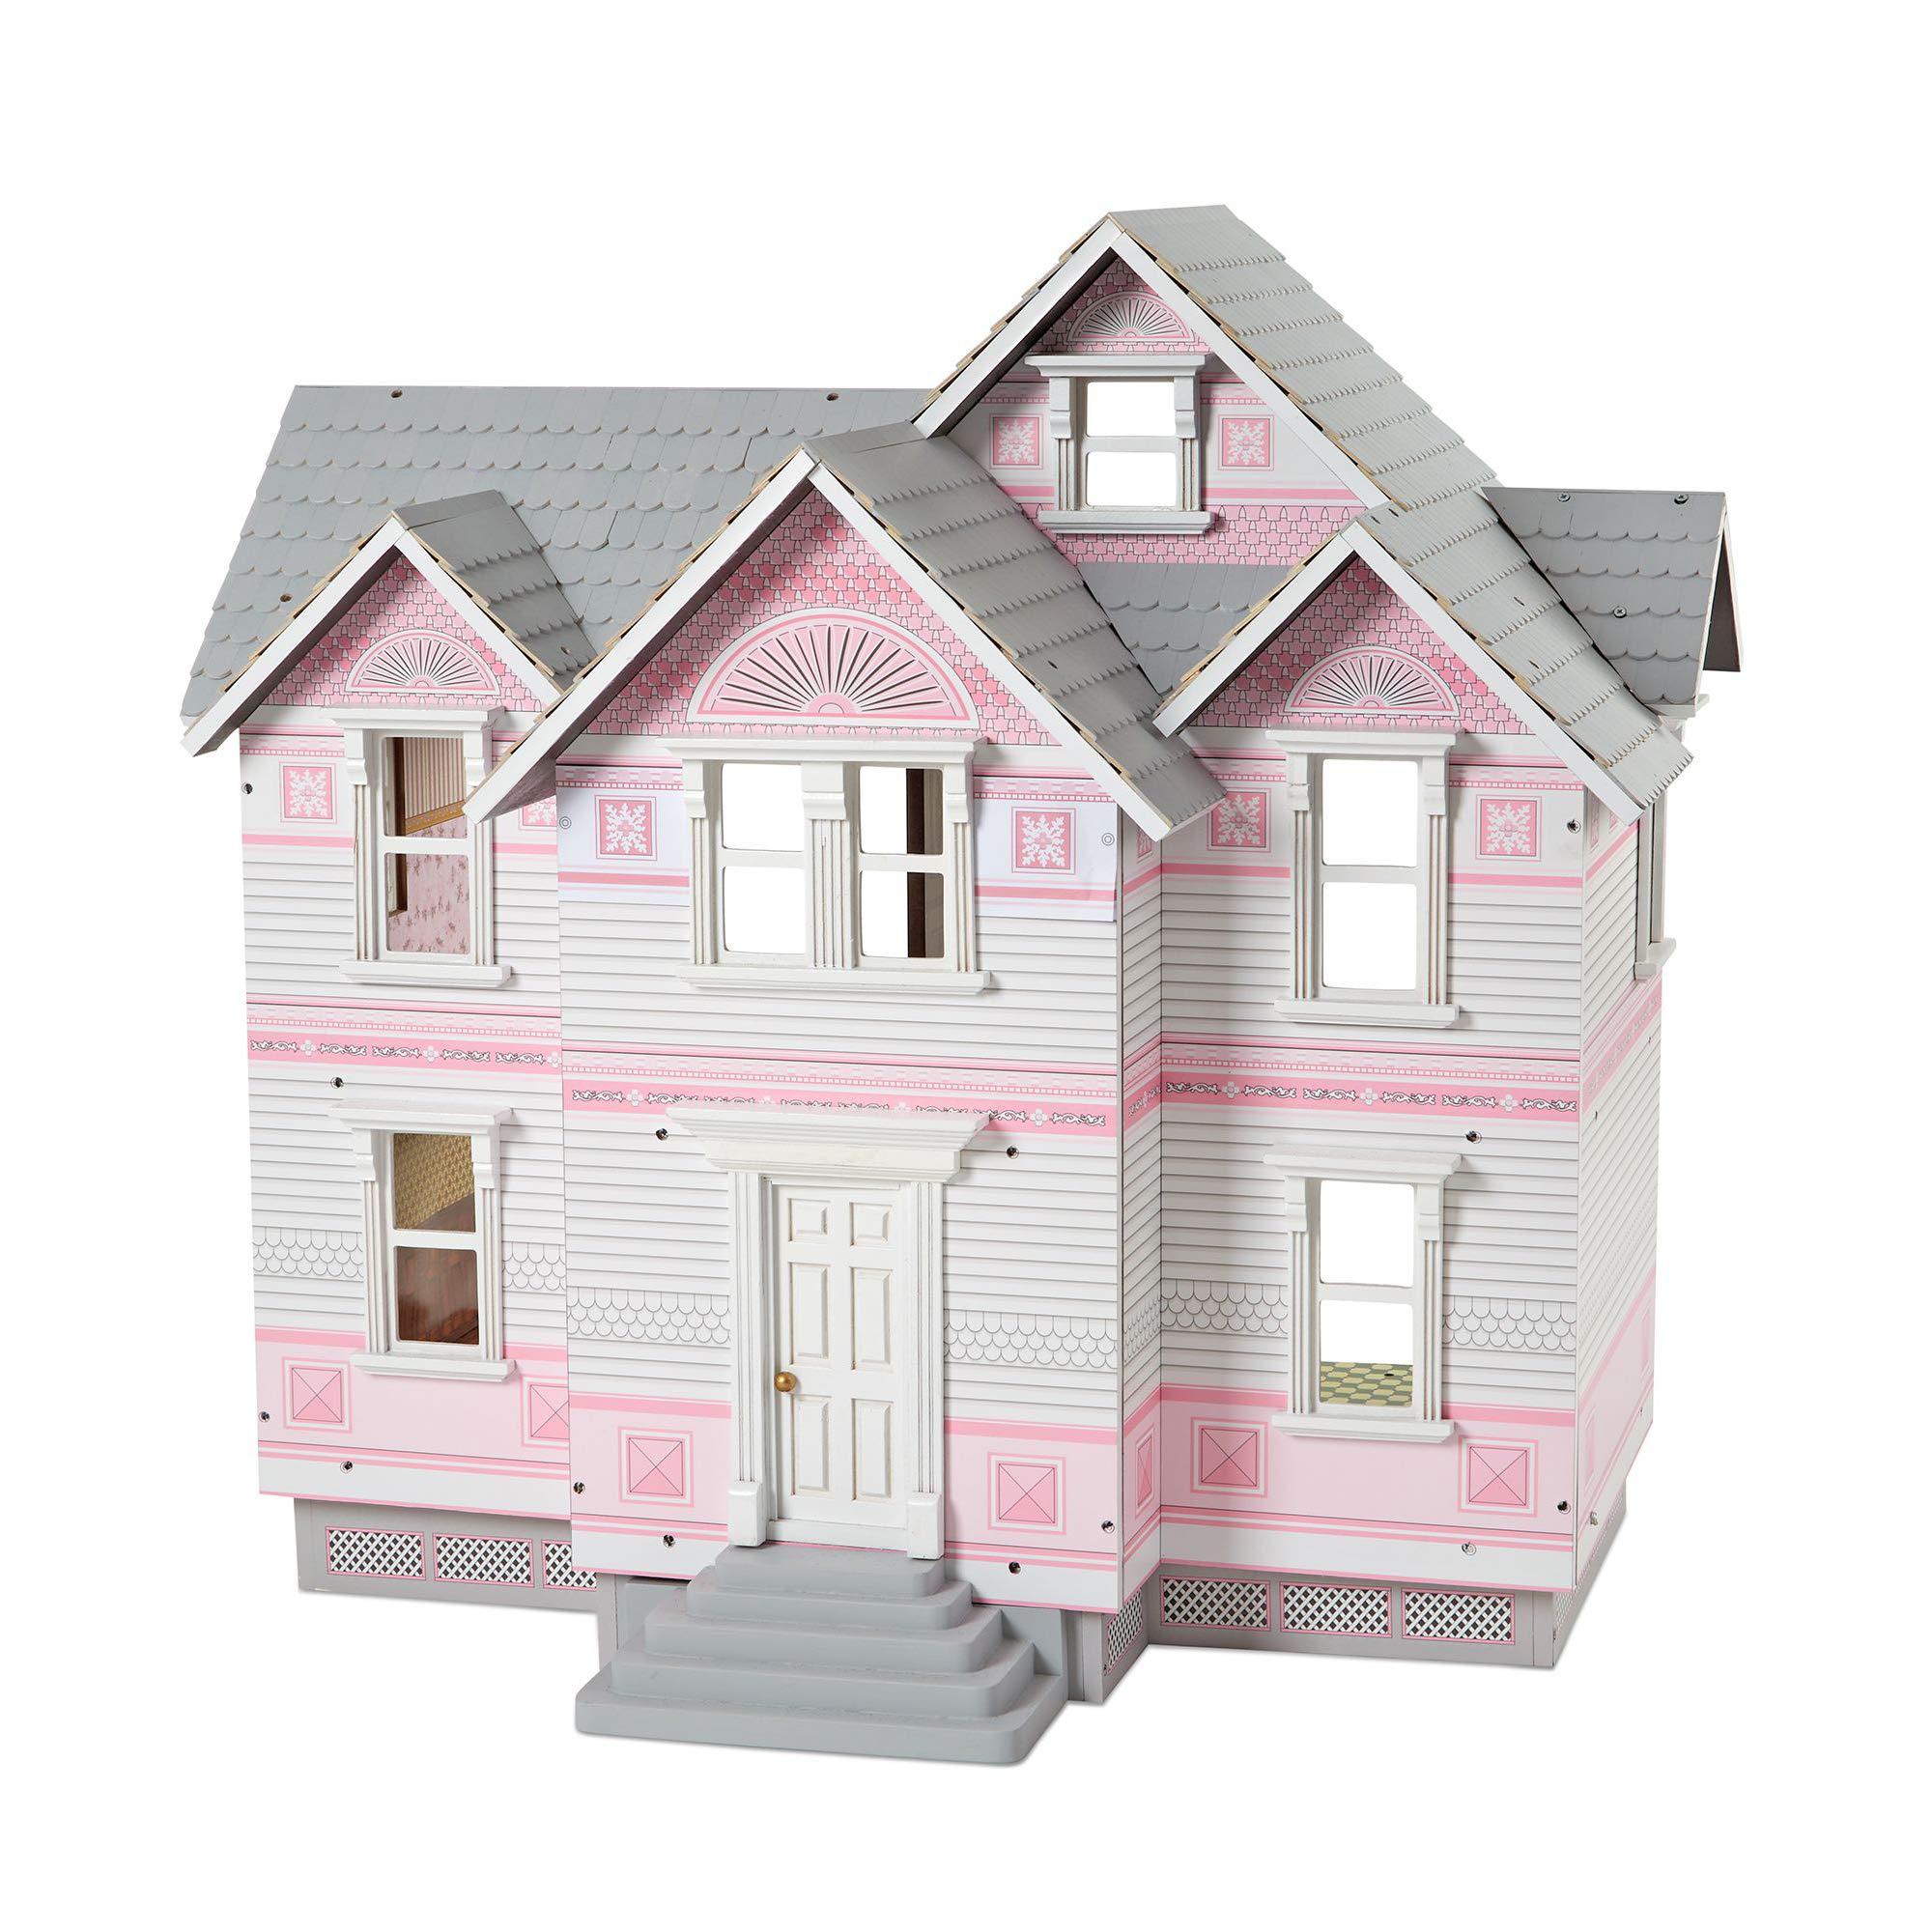 "Melissa & Doug Victorian Dollhouse, Dolls & Dollhouses, Detailed Illustrations, Sturdy Wooden Construction, 29.5"" H x 28"" W x 18"" L"